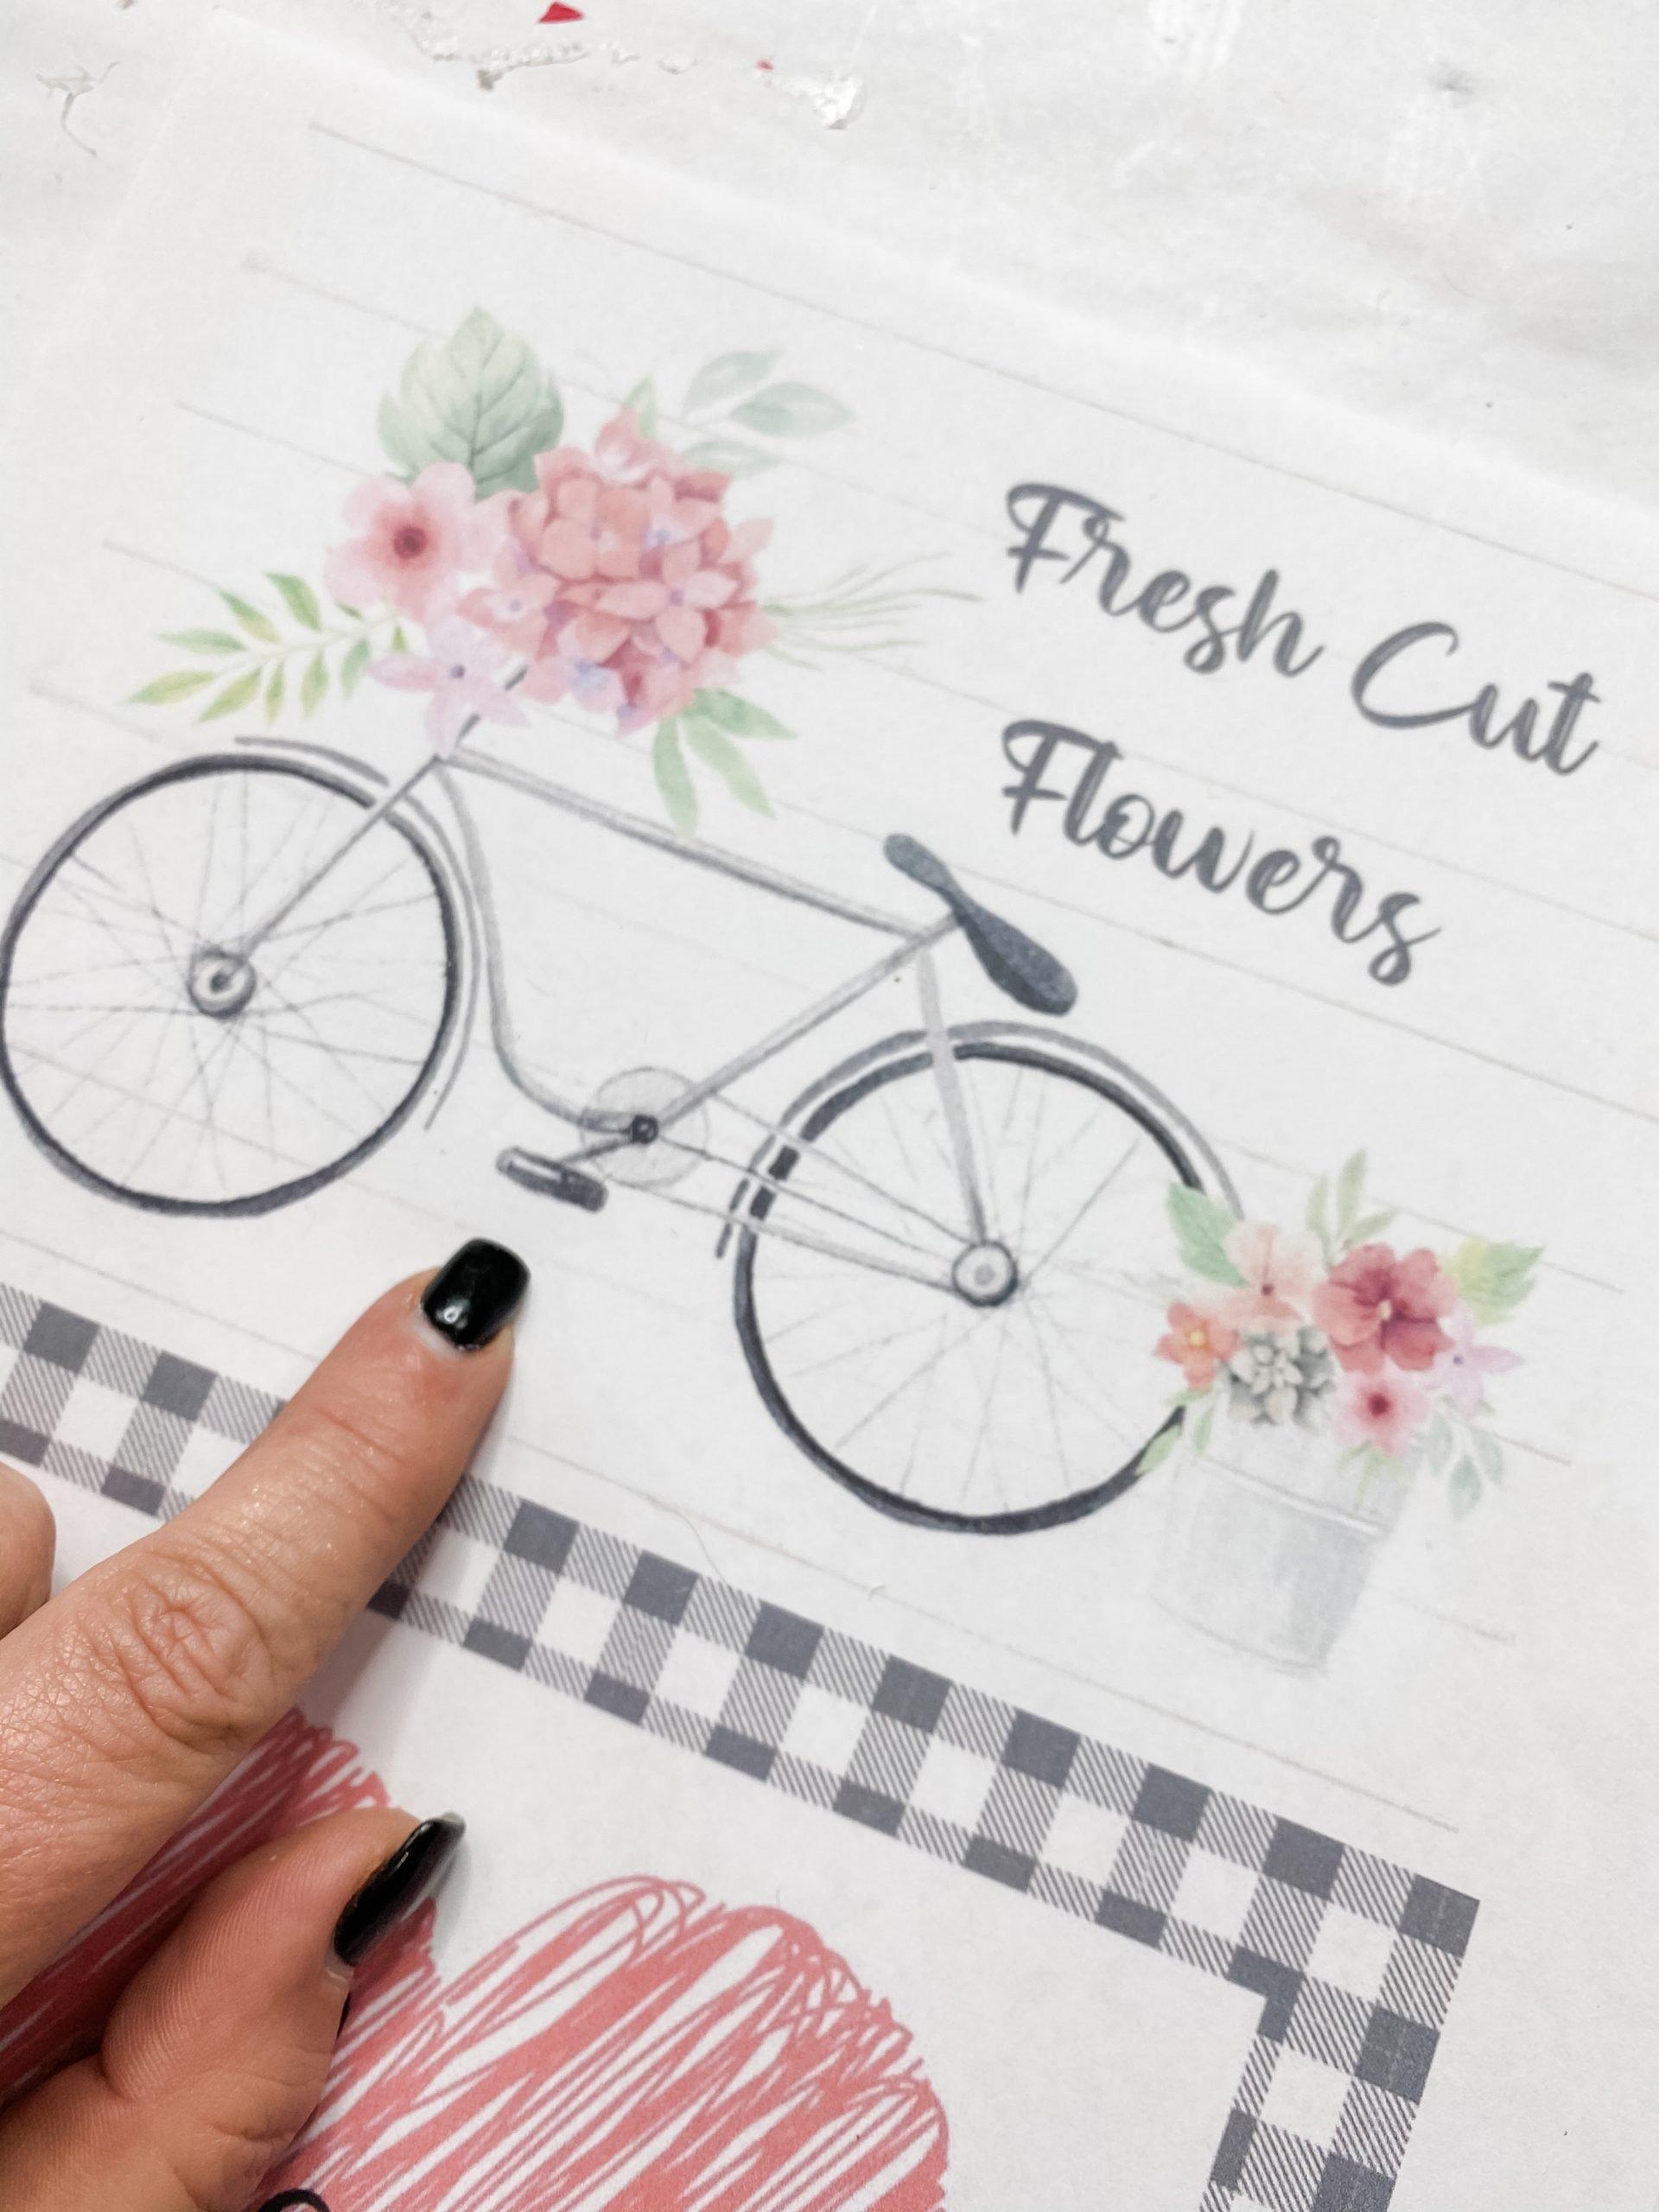 Dollar Tree DIY Spring Decor with Free Printable